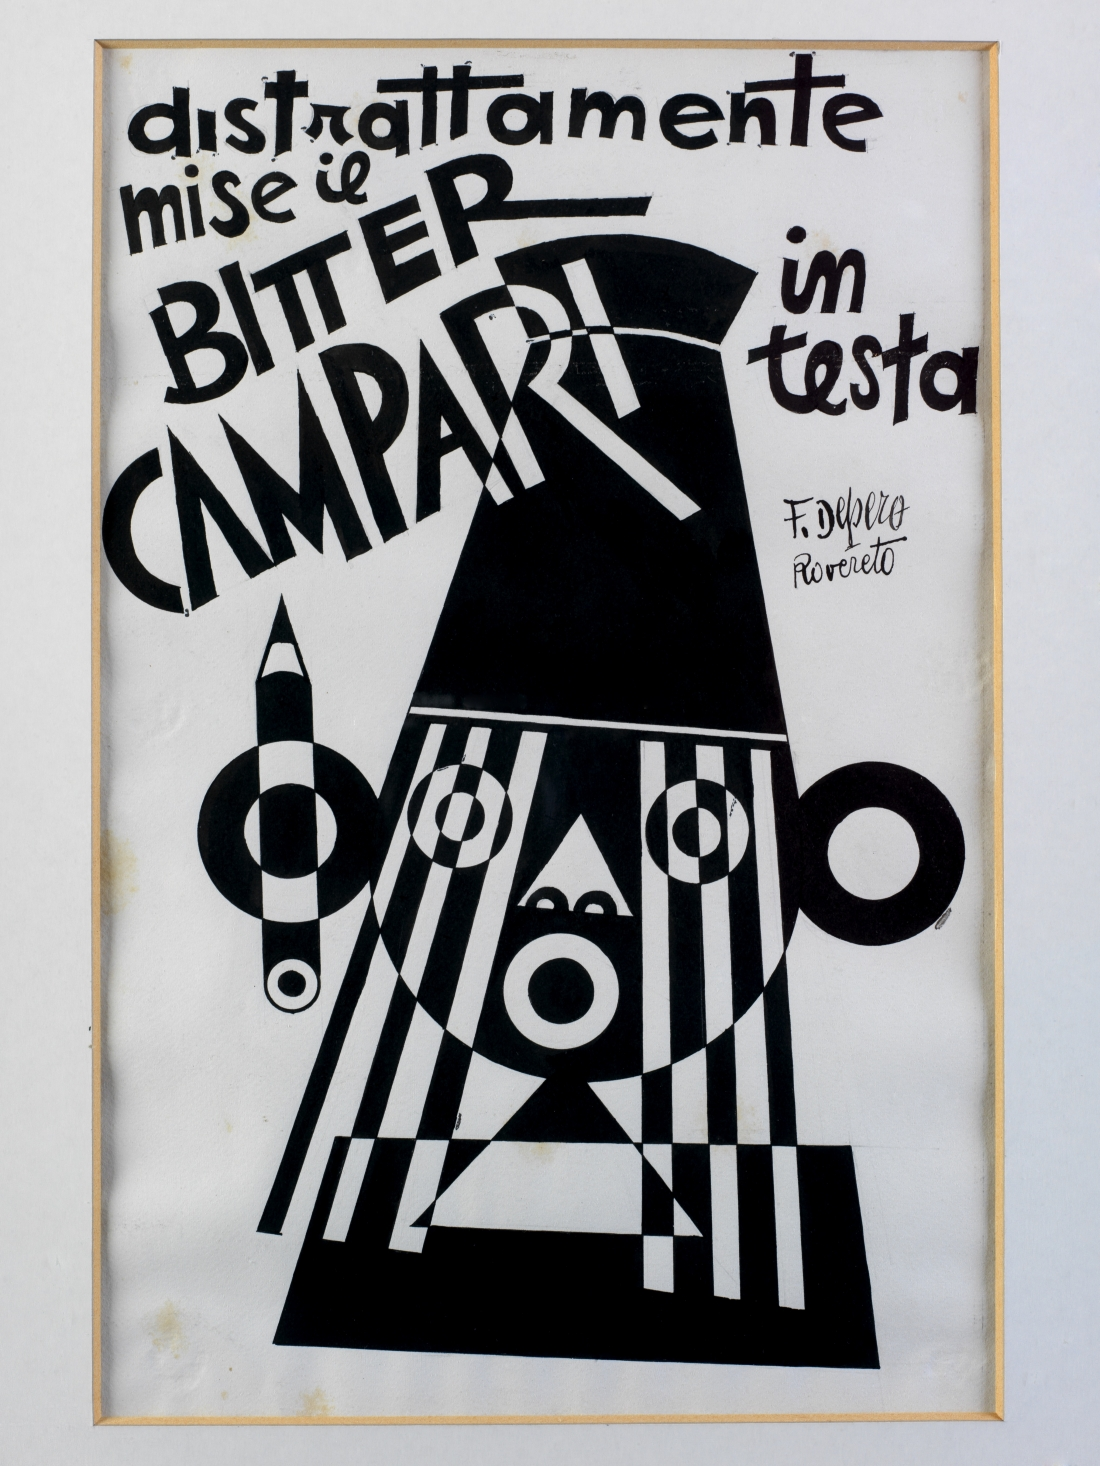 Fortunato Depero, Distrattamente mise il Bitter Campari in testa, 1928. He Distractedly put the Bitter Campari on His Head. Ink on Paper.